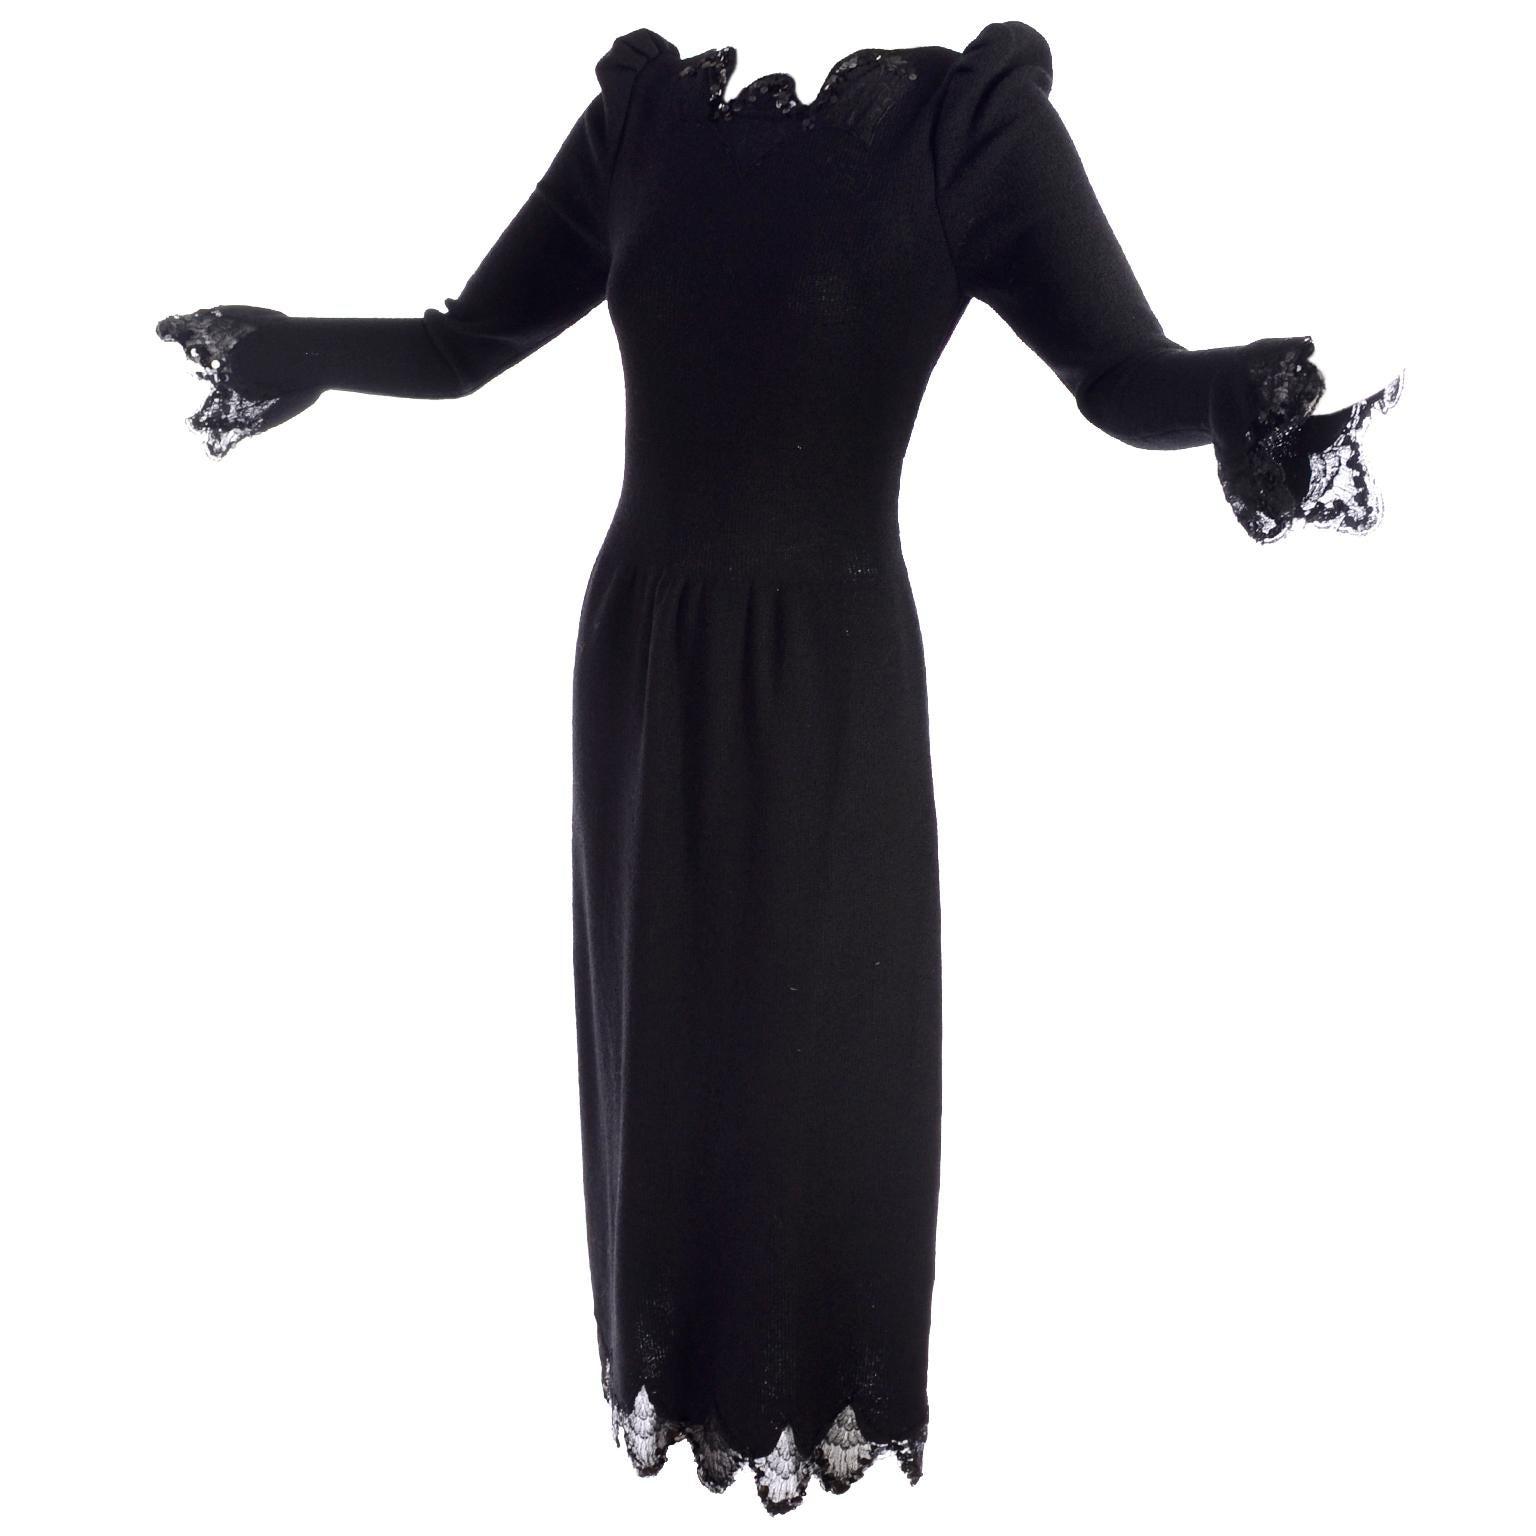 1970s Victorian Revival Adolfo Vintage Black Dress With Lace & Sequin Trim